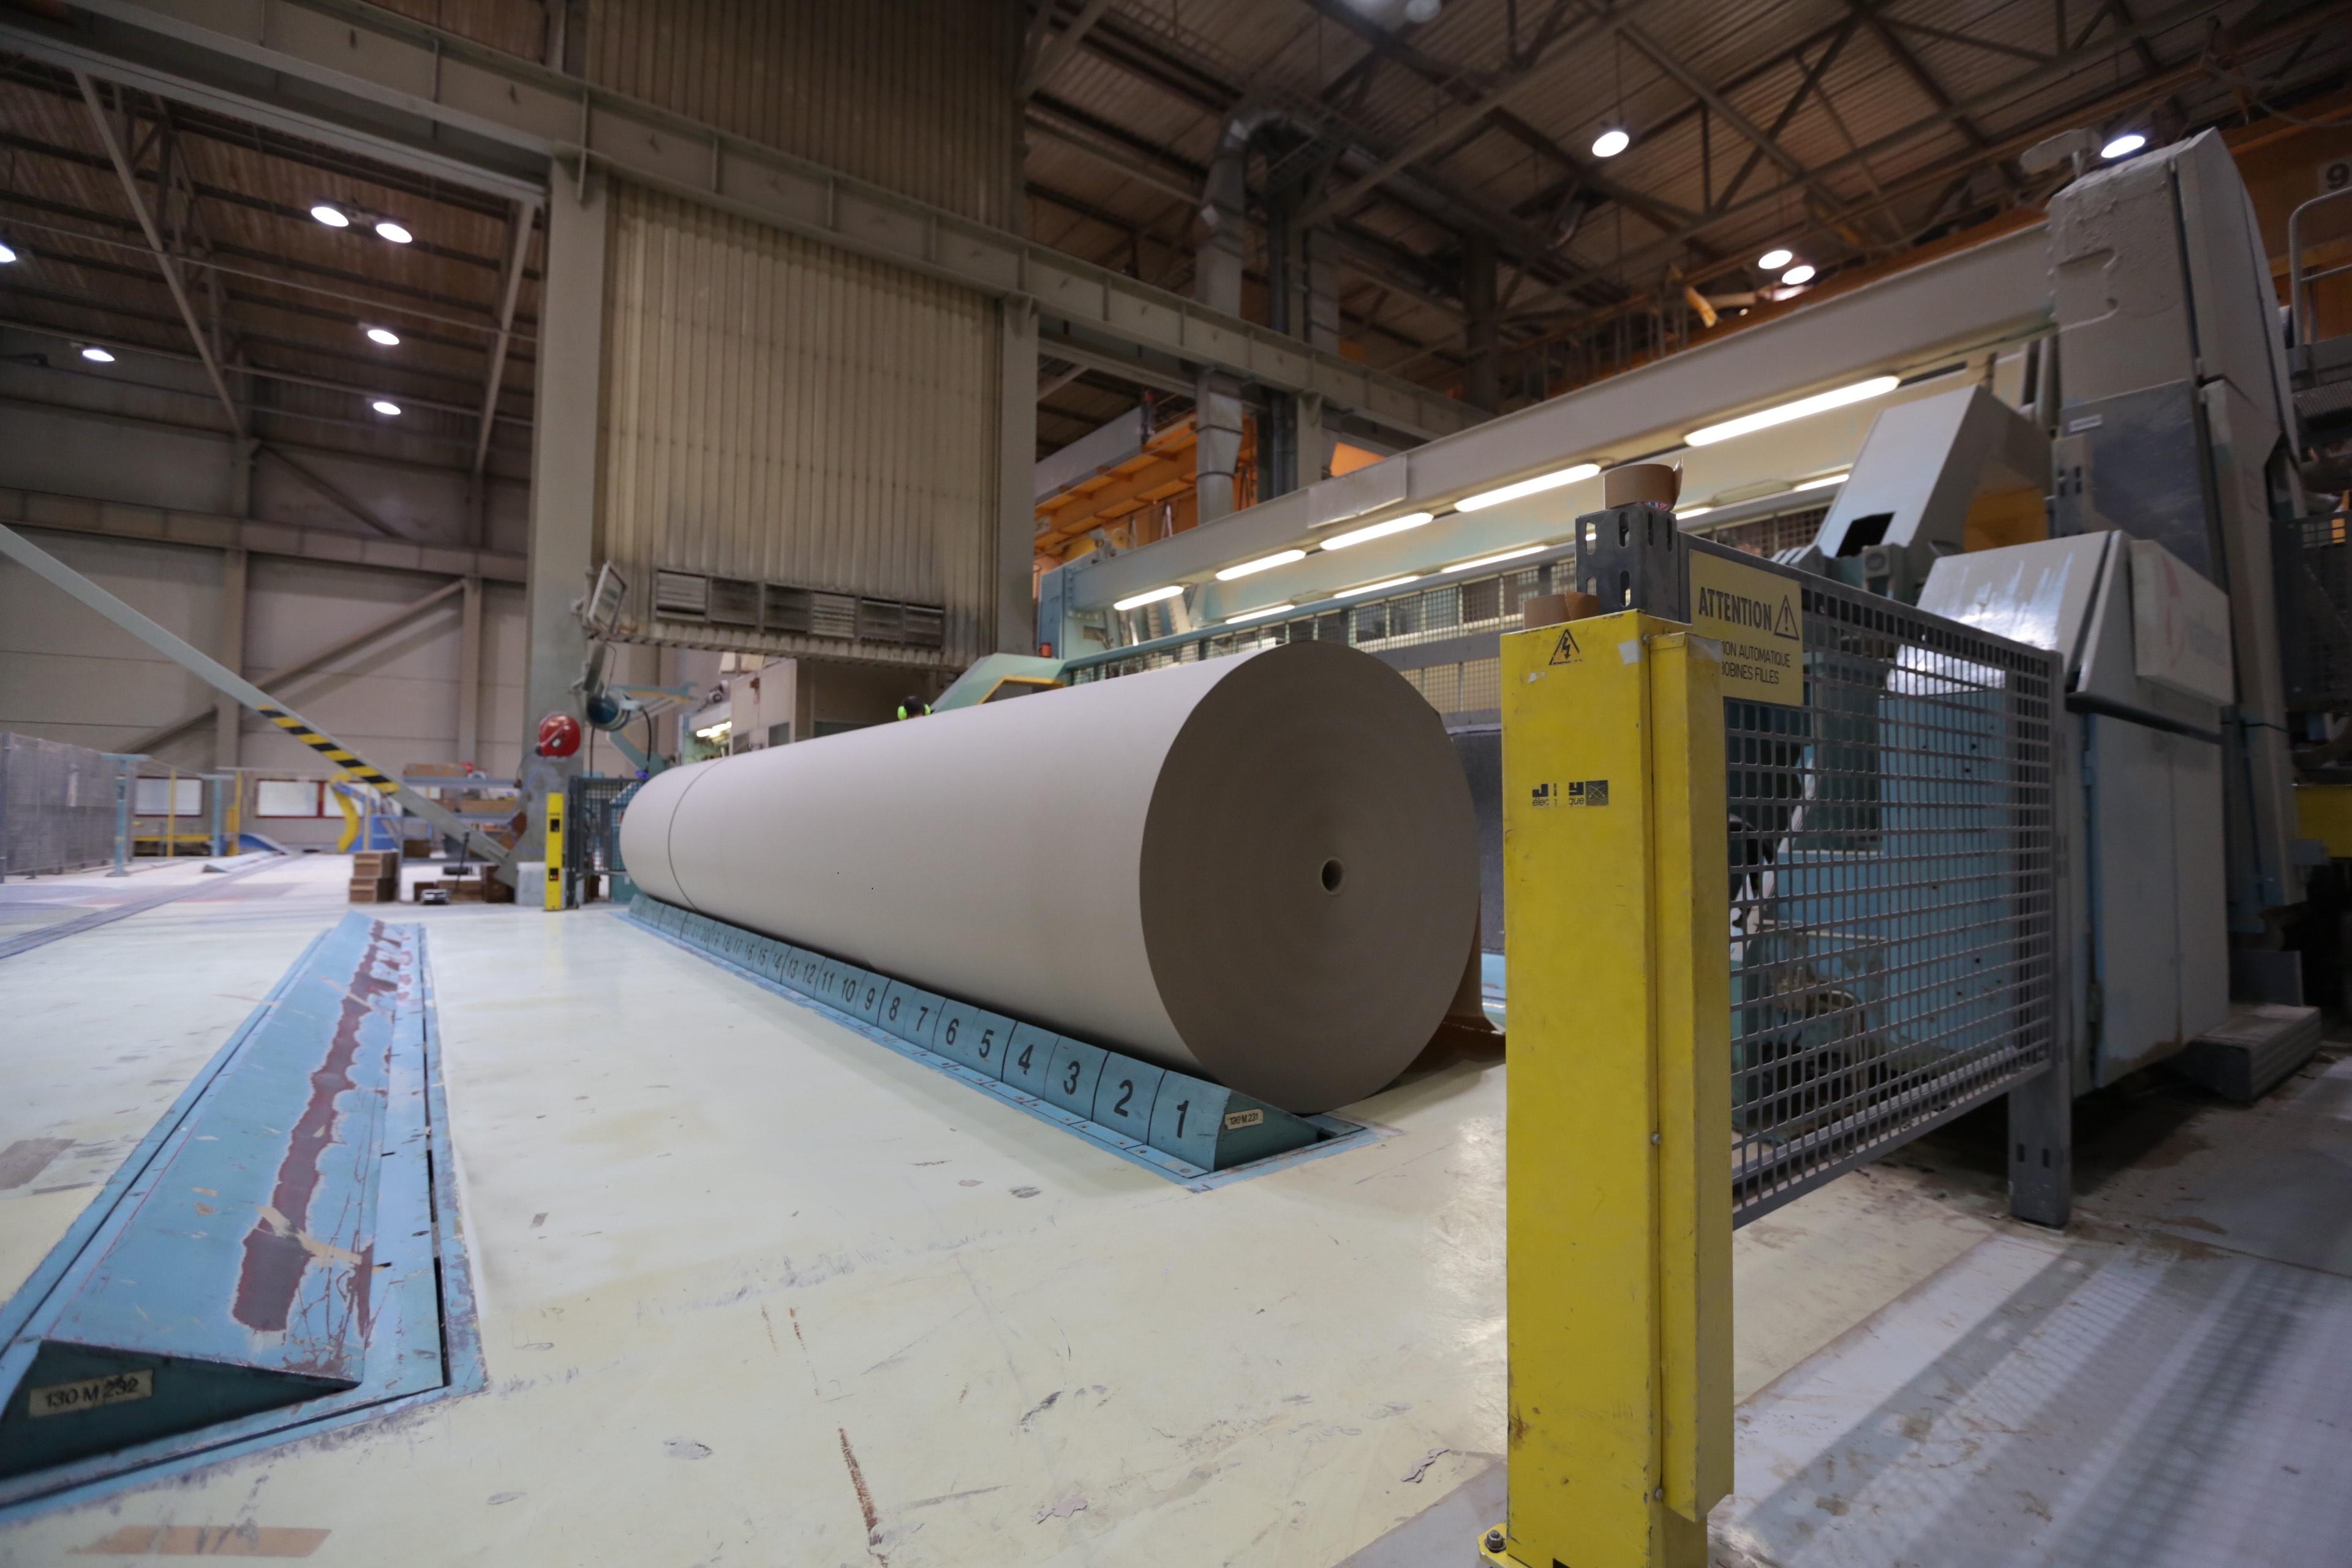 blue-paper-industrie-papetiere-carton-ondule-strasbourg-alsace-jan-klingele-klingele-papierwerke-pierre-macharis-vpk-packaging-francois-bru